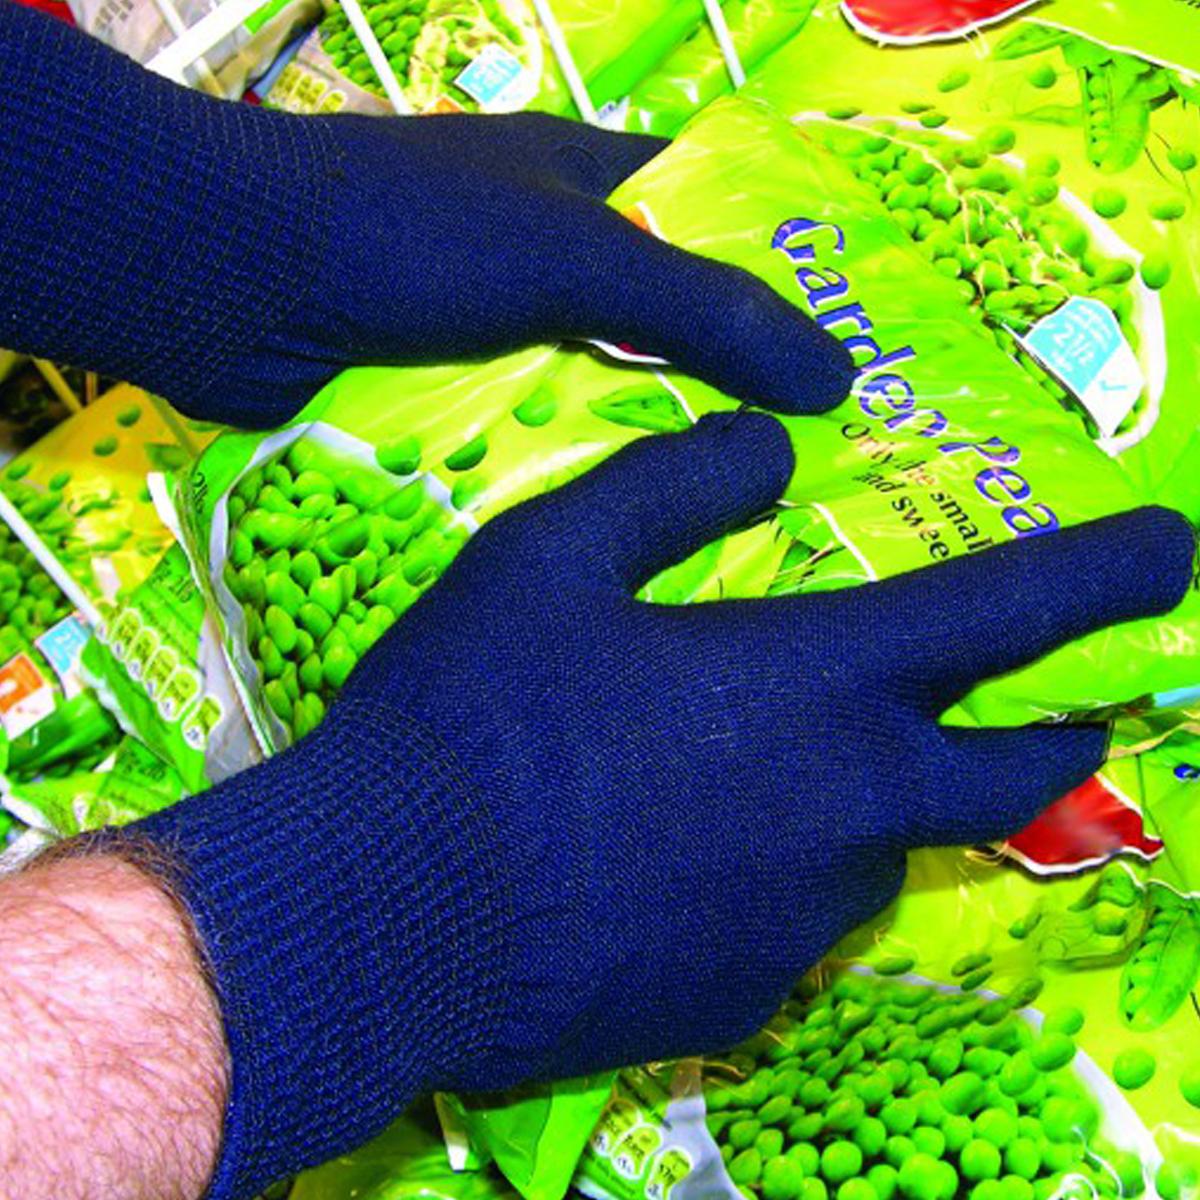 guantes para tratar congelados